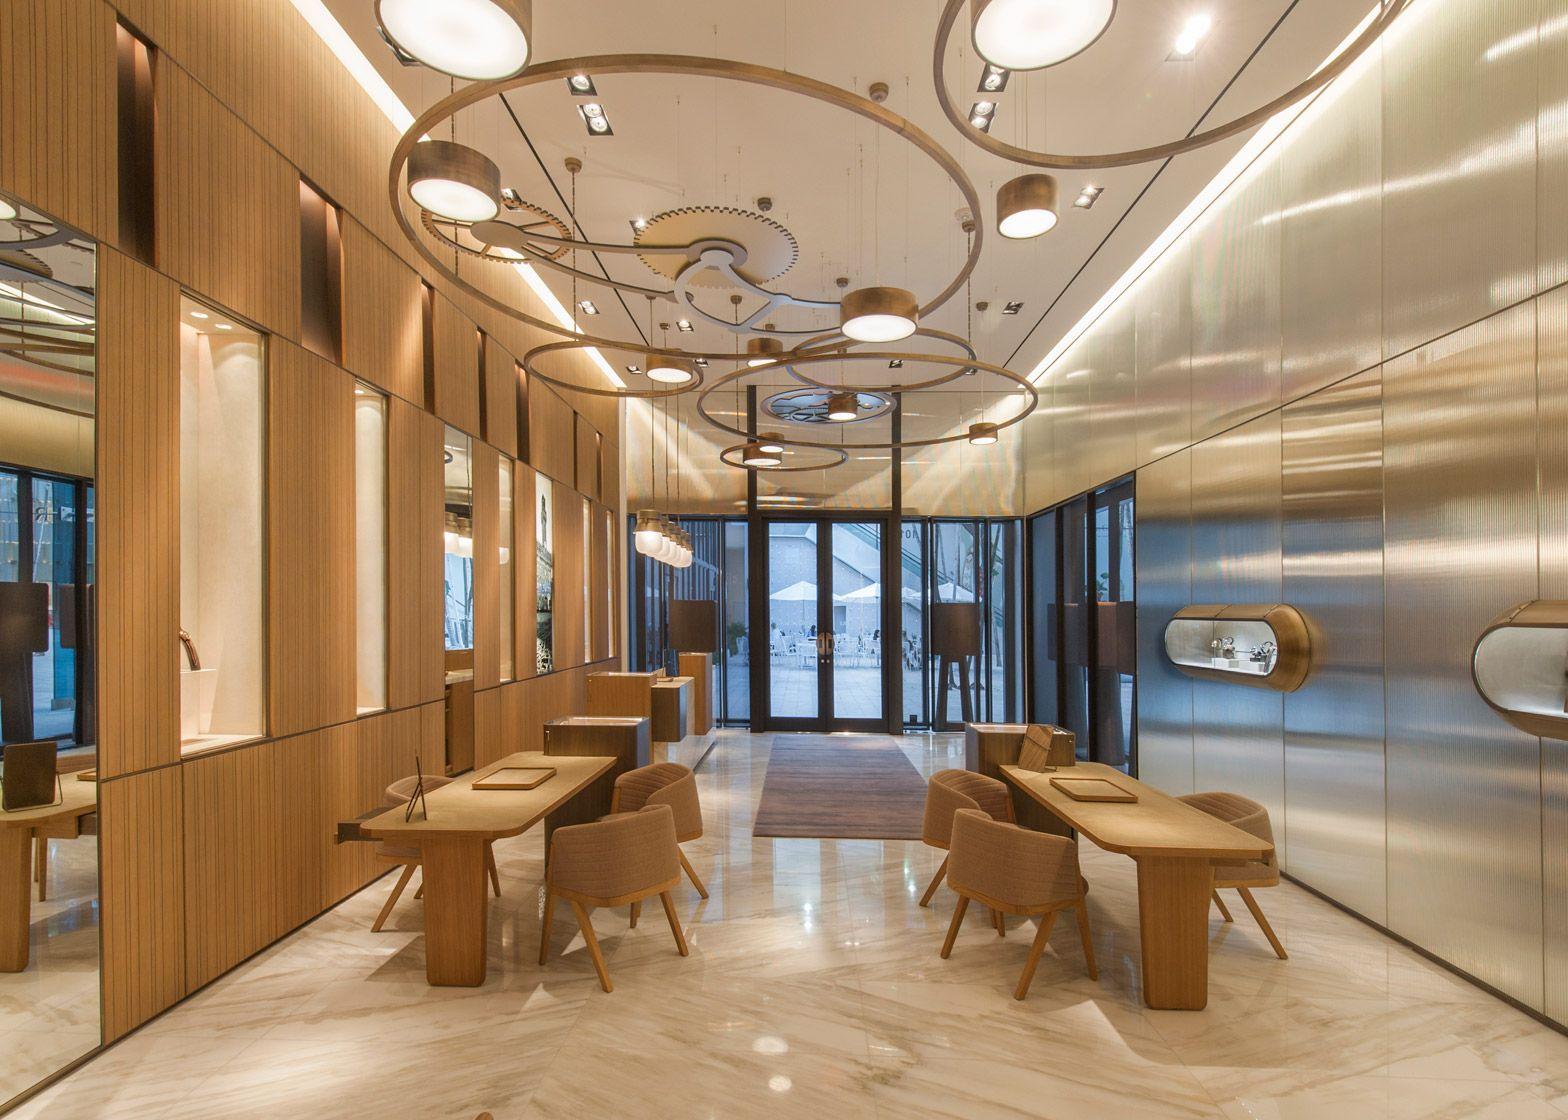 Patricia Urquiolas Miami Panerai Shop Was Inspired By Watches Retail Store DesignRetail StoresTop Interior DesignersRetail